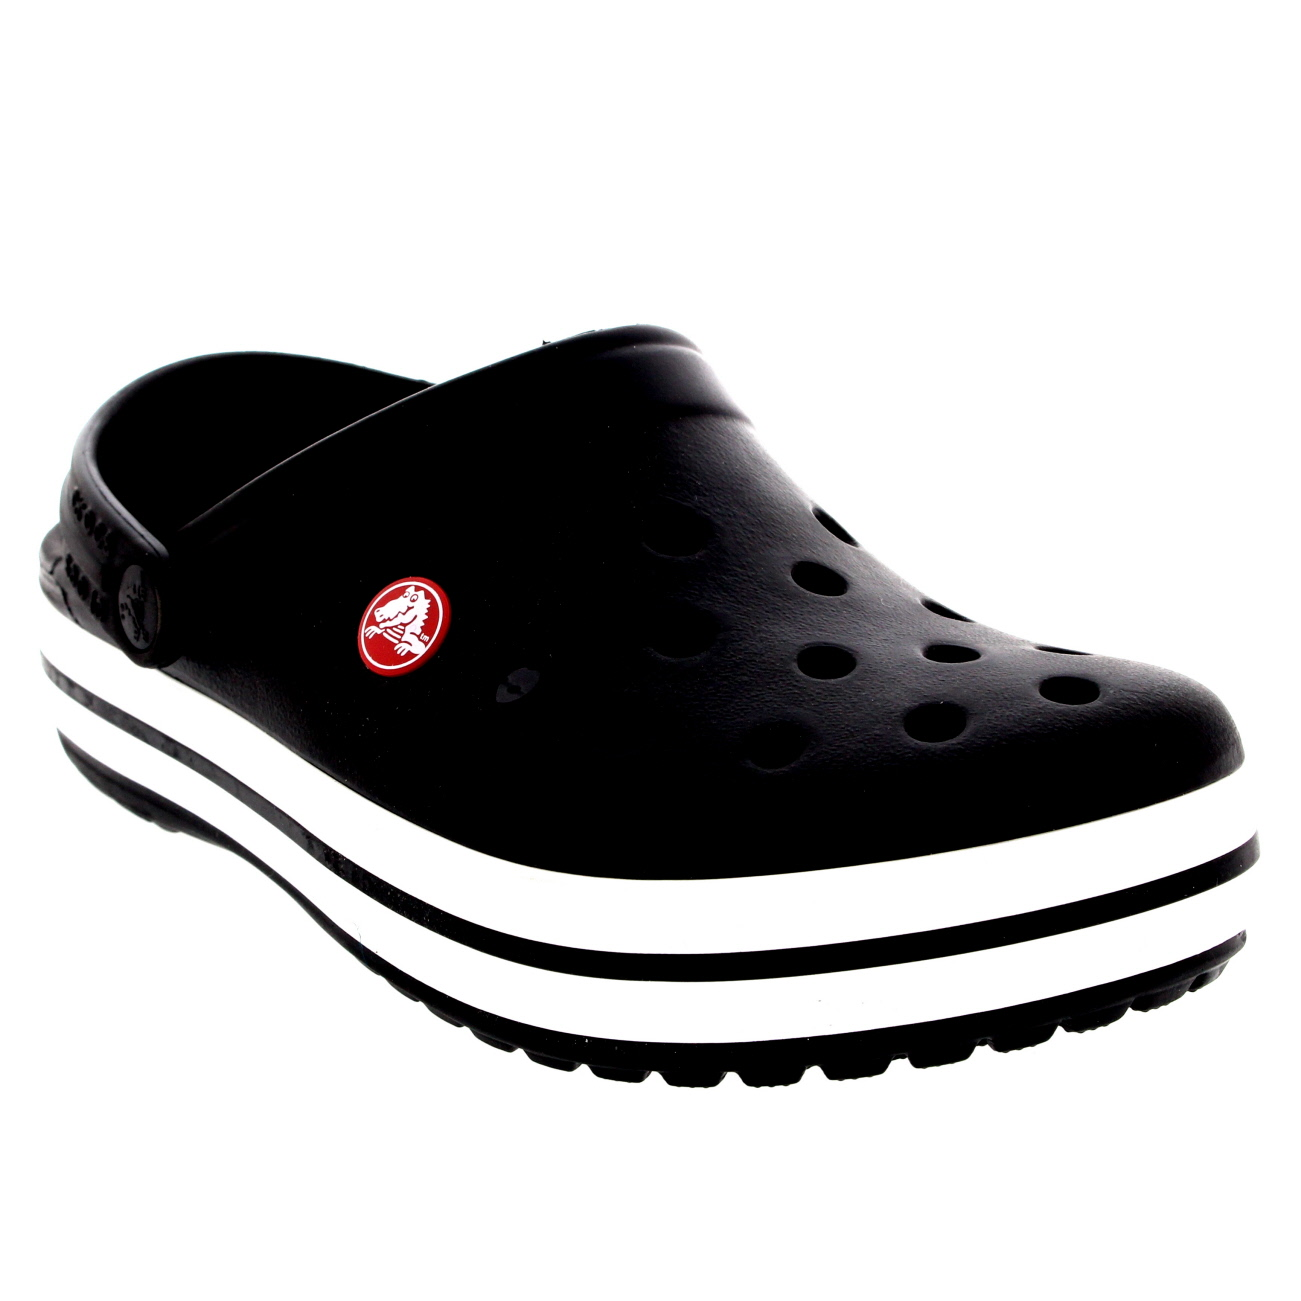 outlet store e2a73 c30e4 Unisex Mens Womens Crocs Crocband Clogs Mules Slipper Summer Beach ...